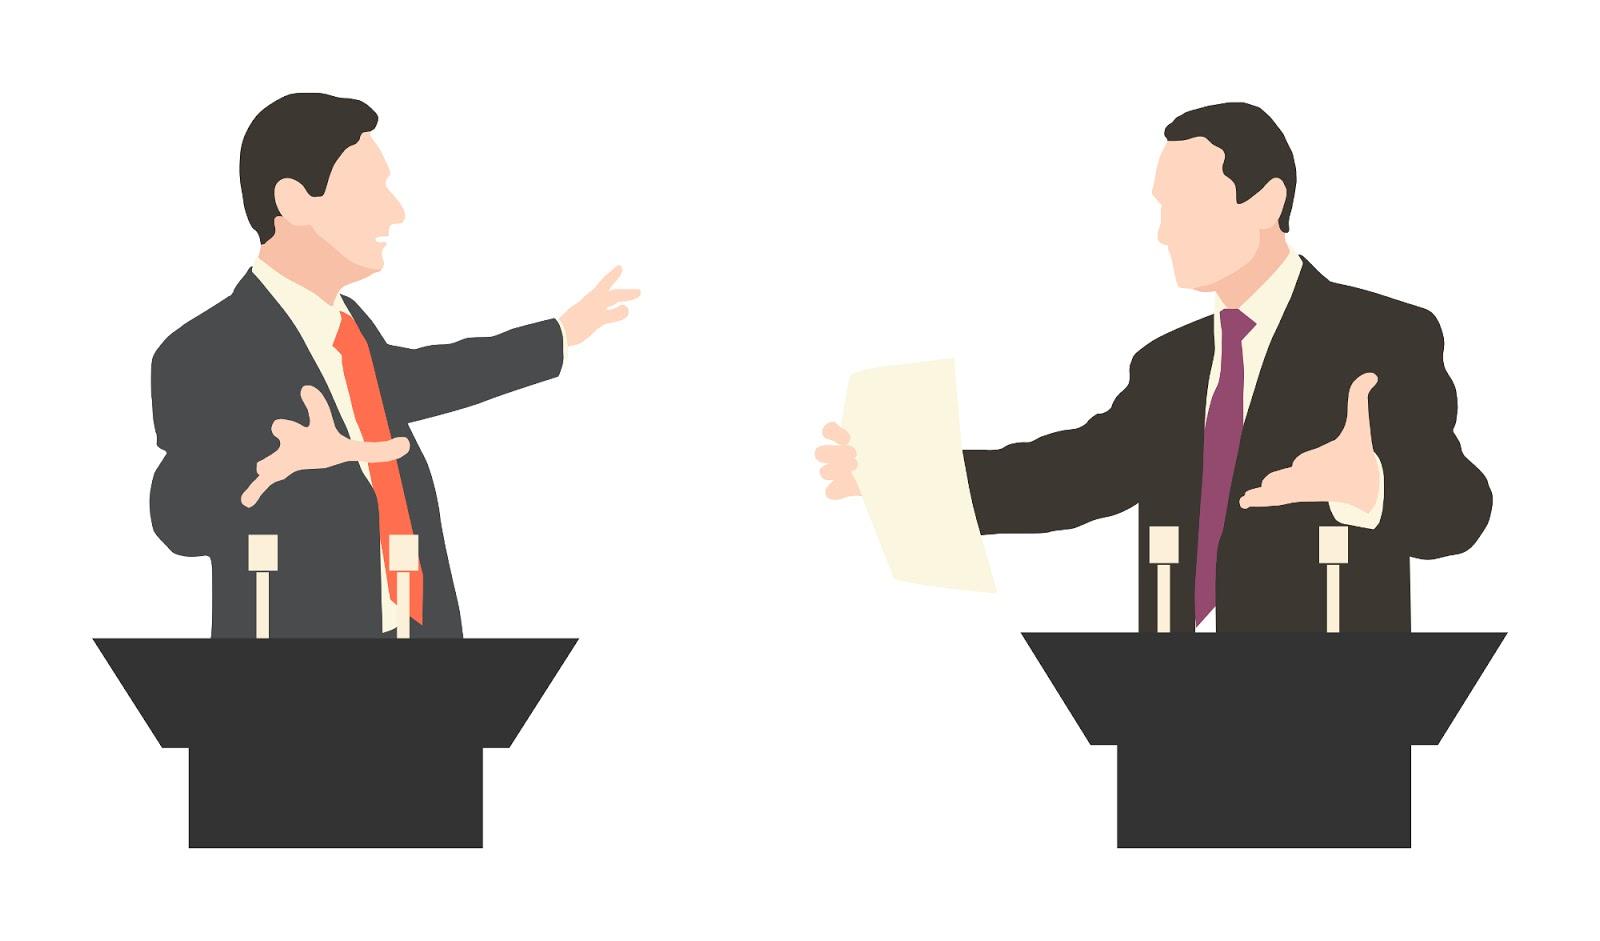 Pengertian Debat Unsur Tujuan Ciri Jenis Tata Cara Dan Struktur